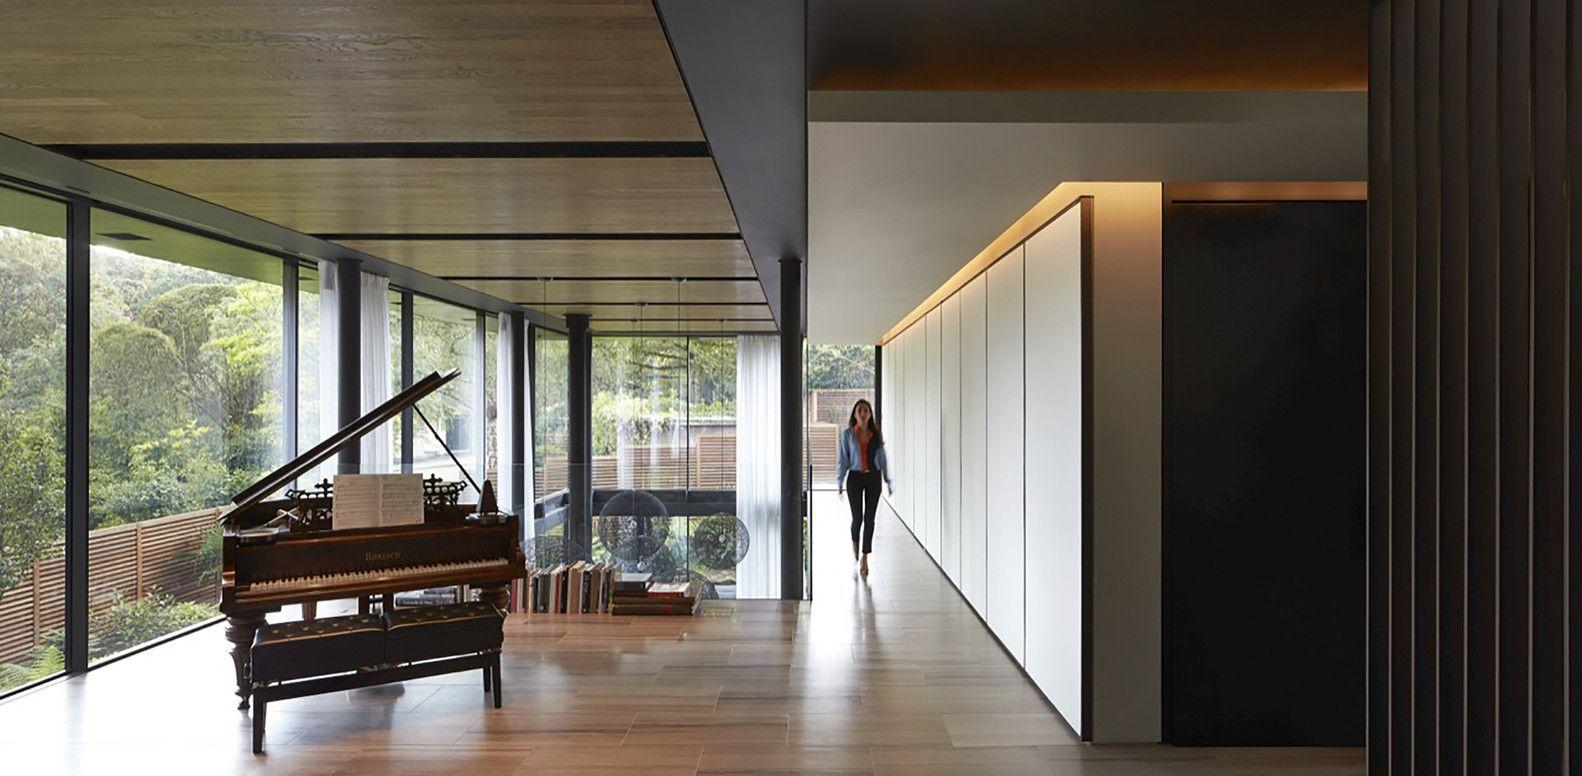 Galeria - Residência no Parque Fitzroy / Stanton Williams - 5